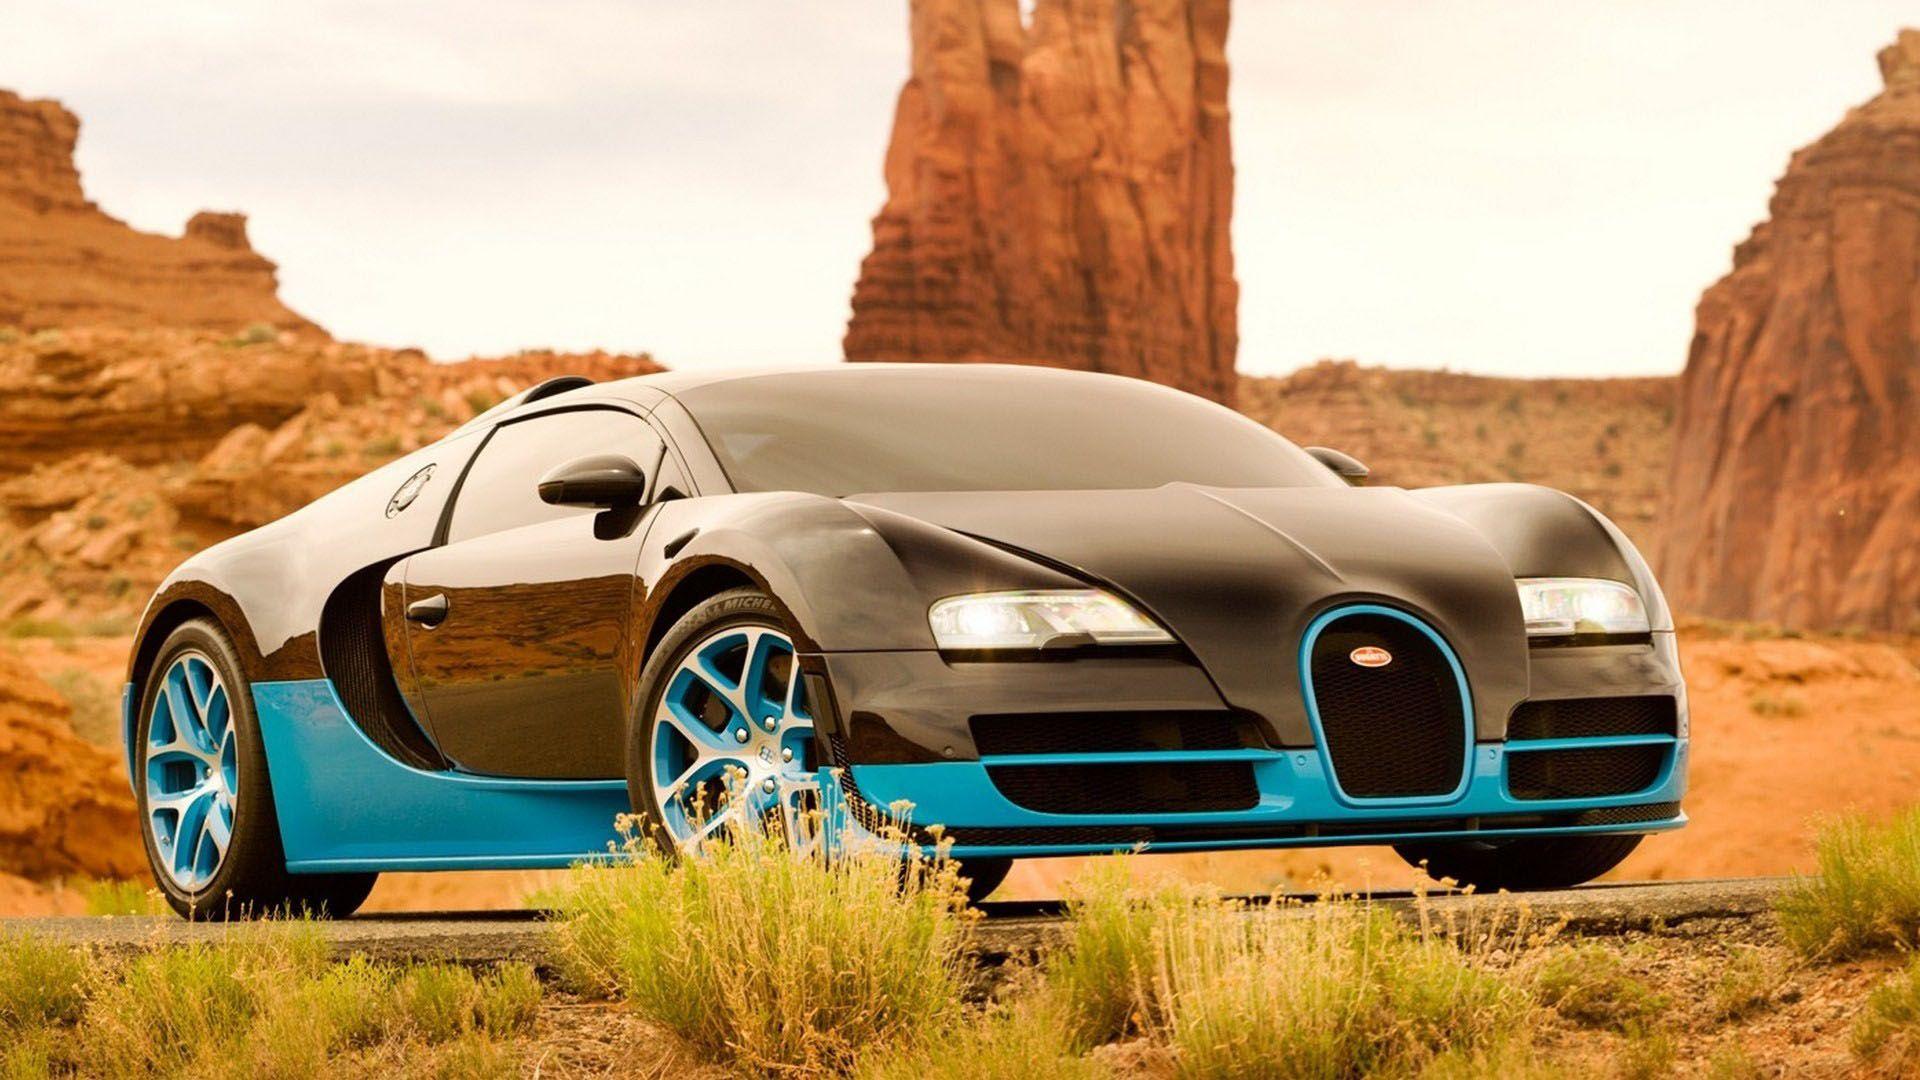 2adbae2763659b3dcc48e86e5d5514ec Inspiring Bugatti Veyron Quarter Mile Speed Cars Trend